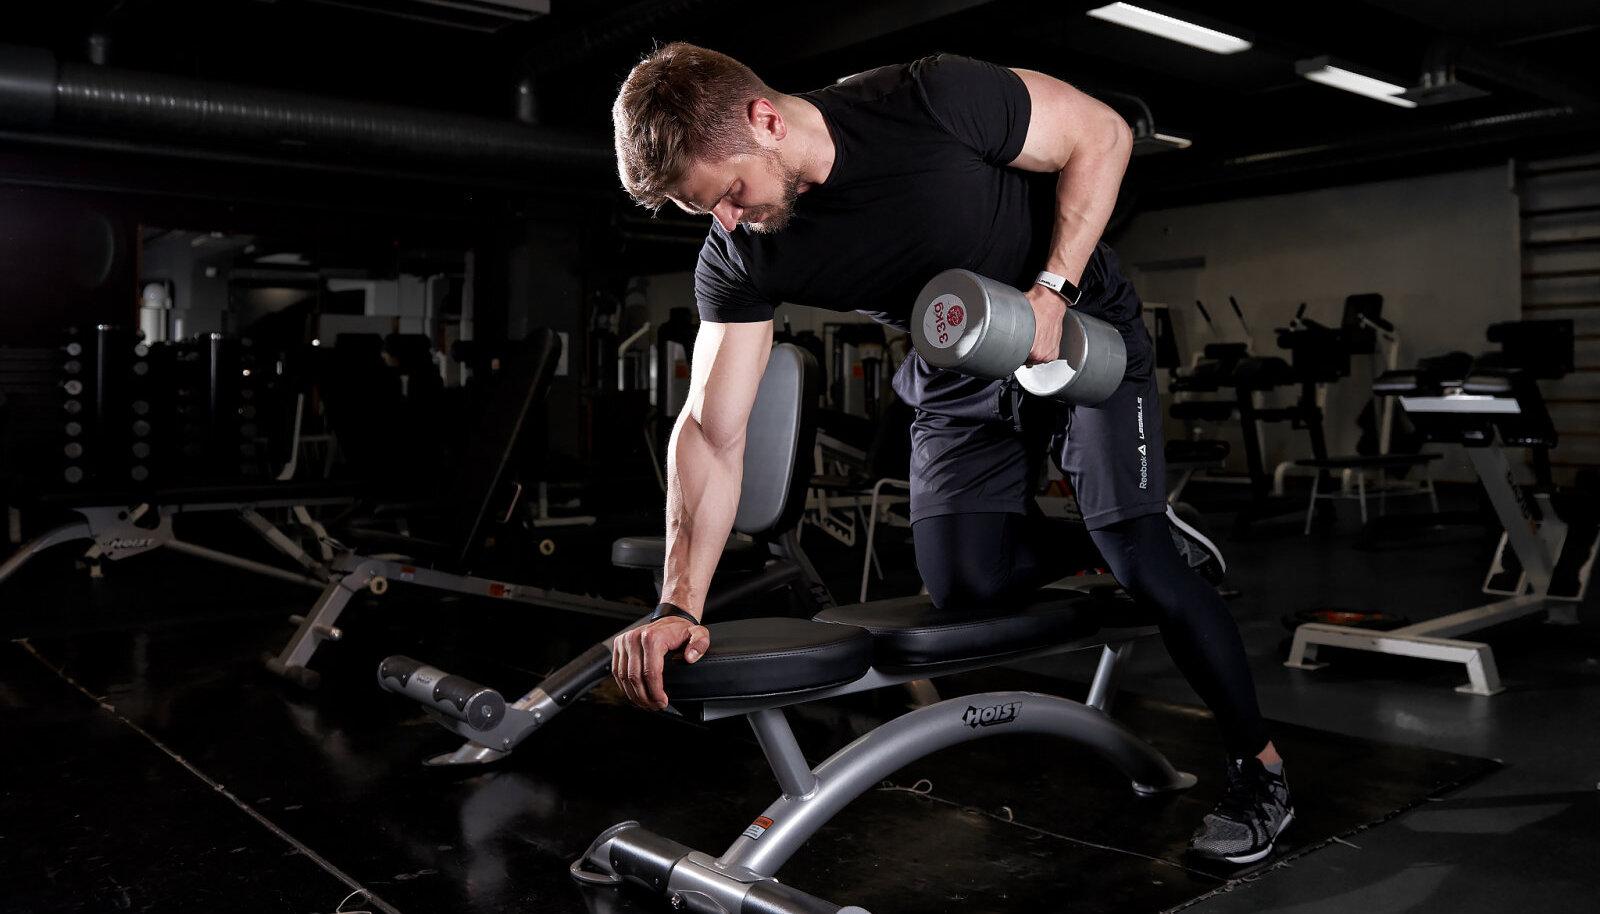 kuidas intervalli treening poletab rasva